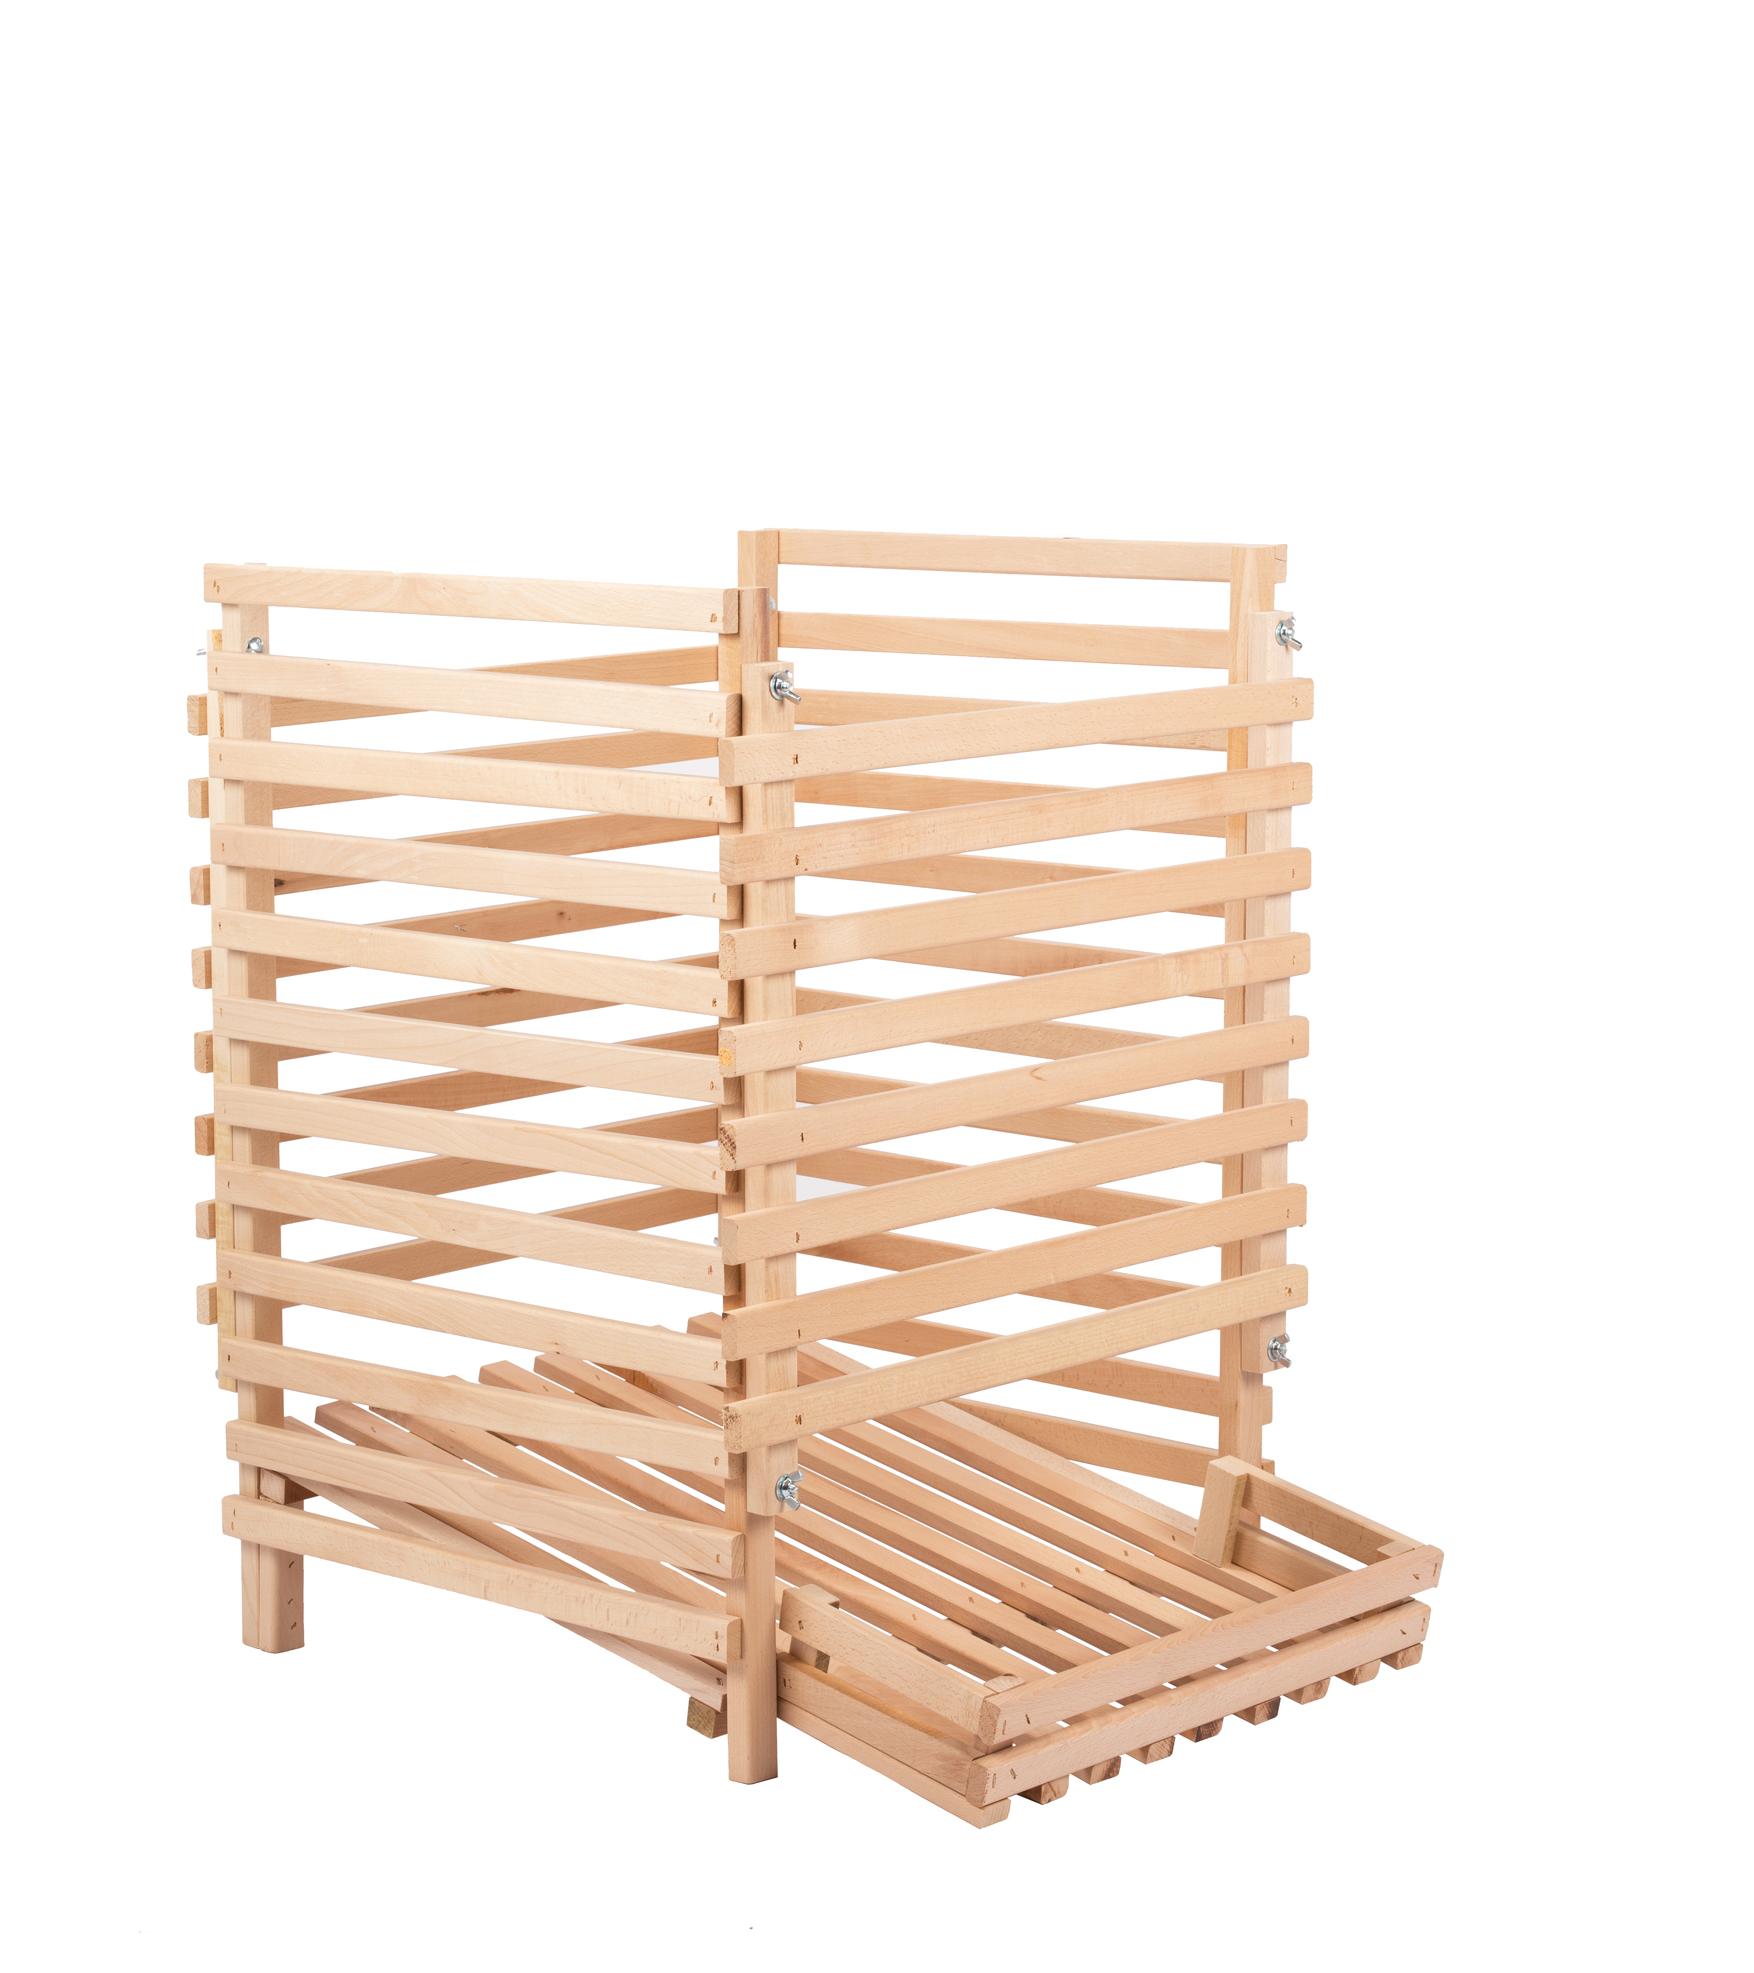 rival kartoffelbox gem sebox ca 5 kg aufbewahrung vorratsbox kartoffel gem se ebay. Black Bedroom Furniture Sets. Home Design Ideas